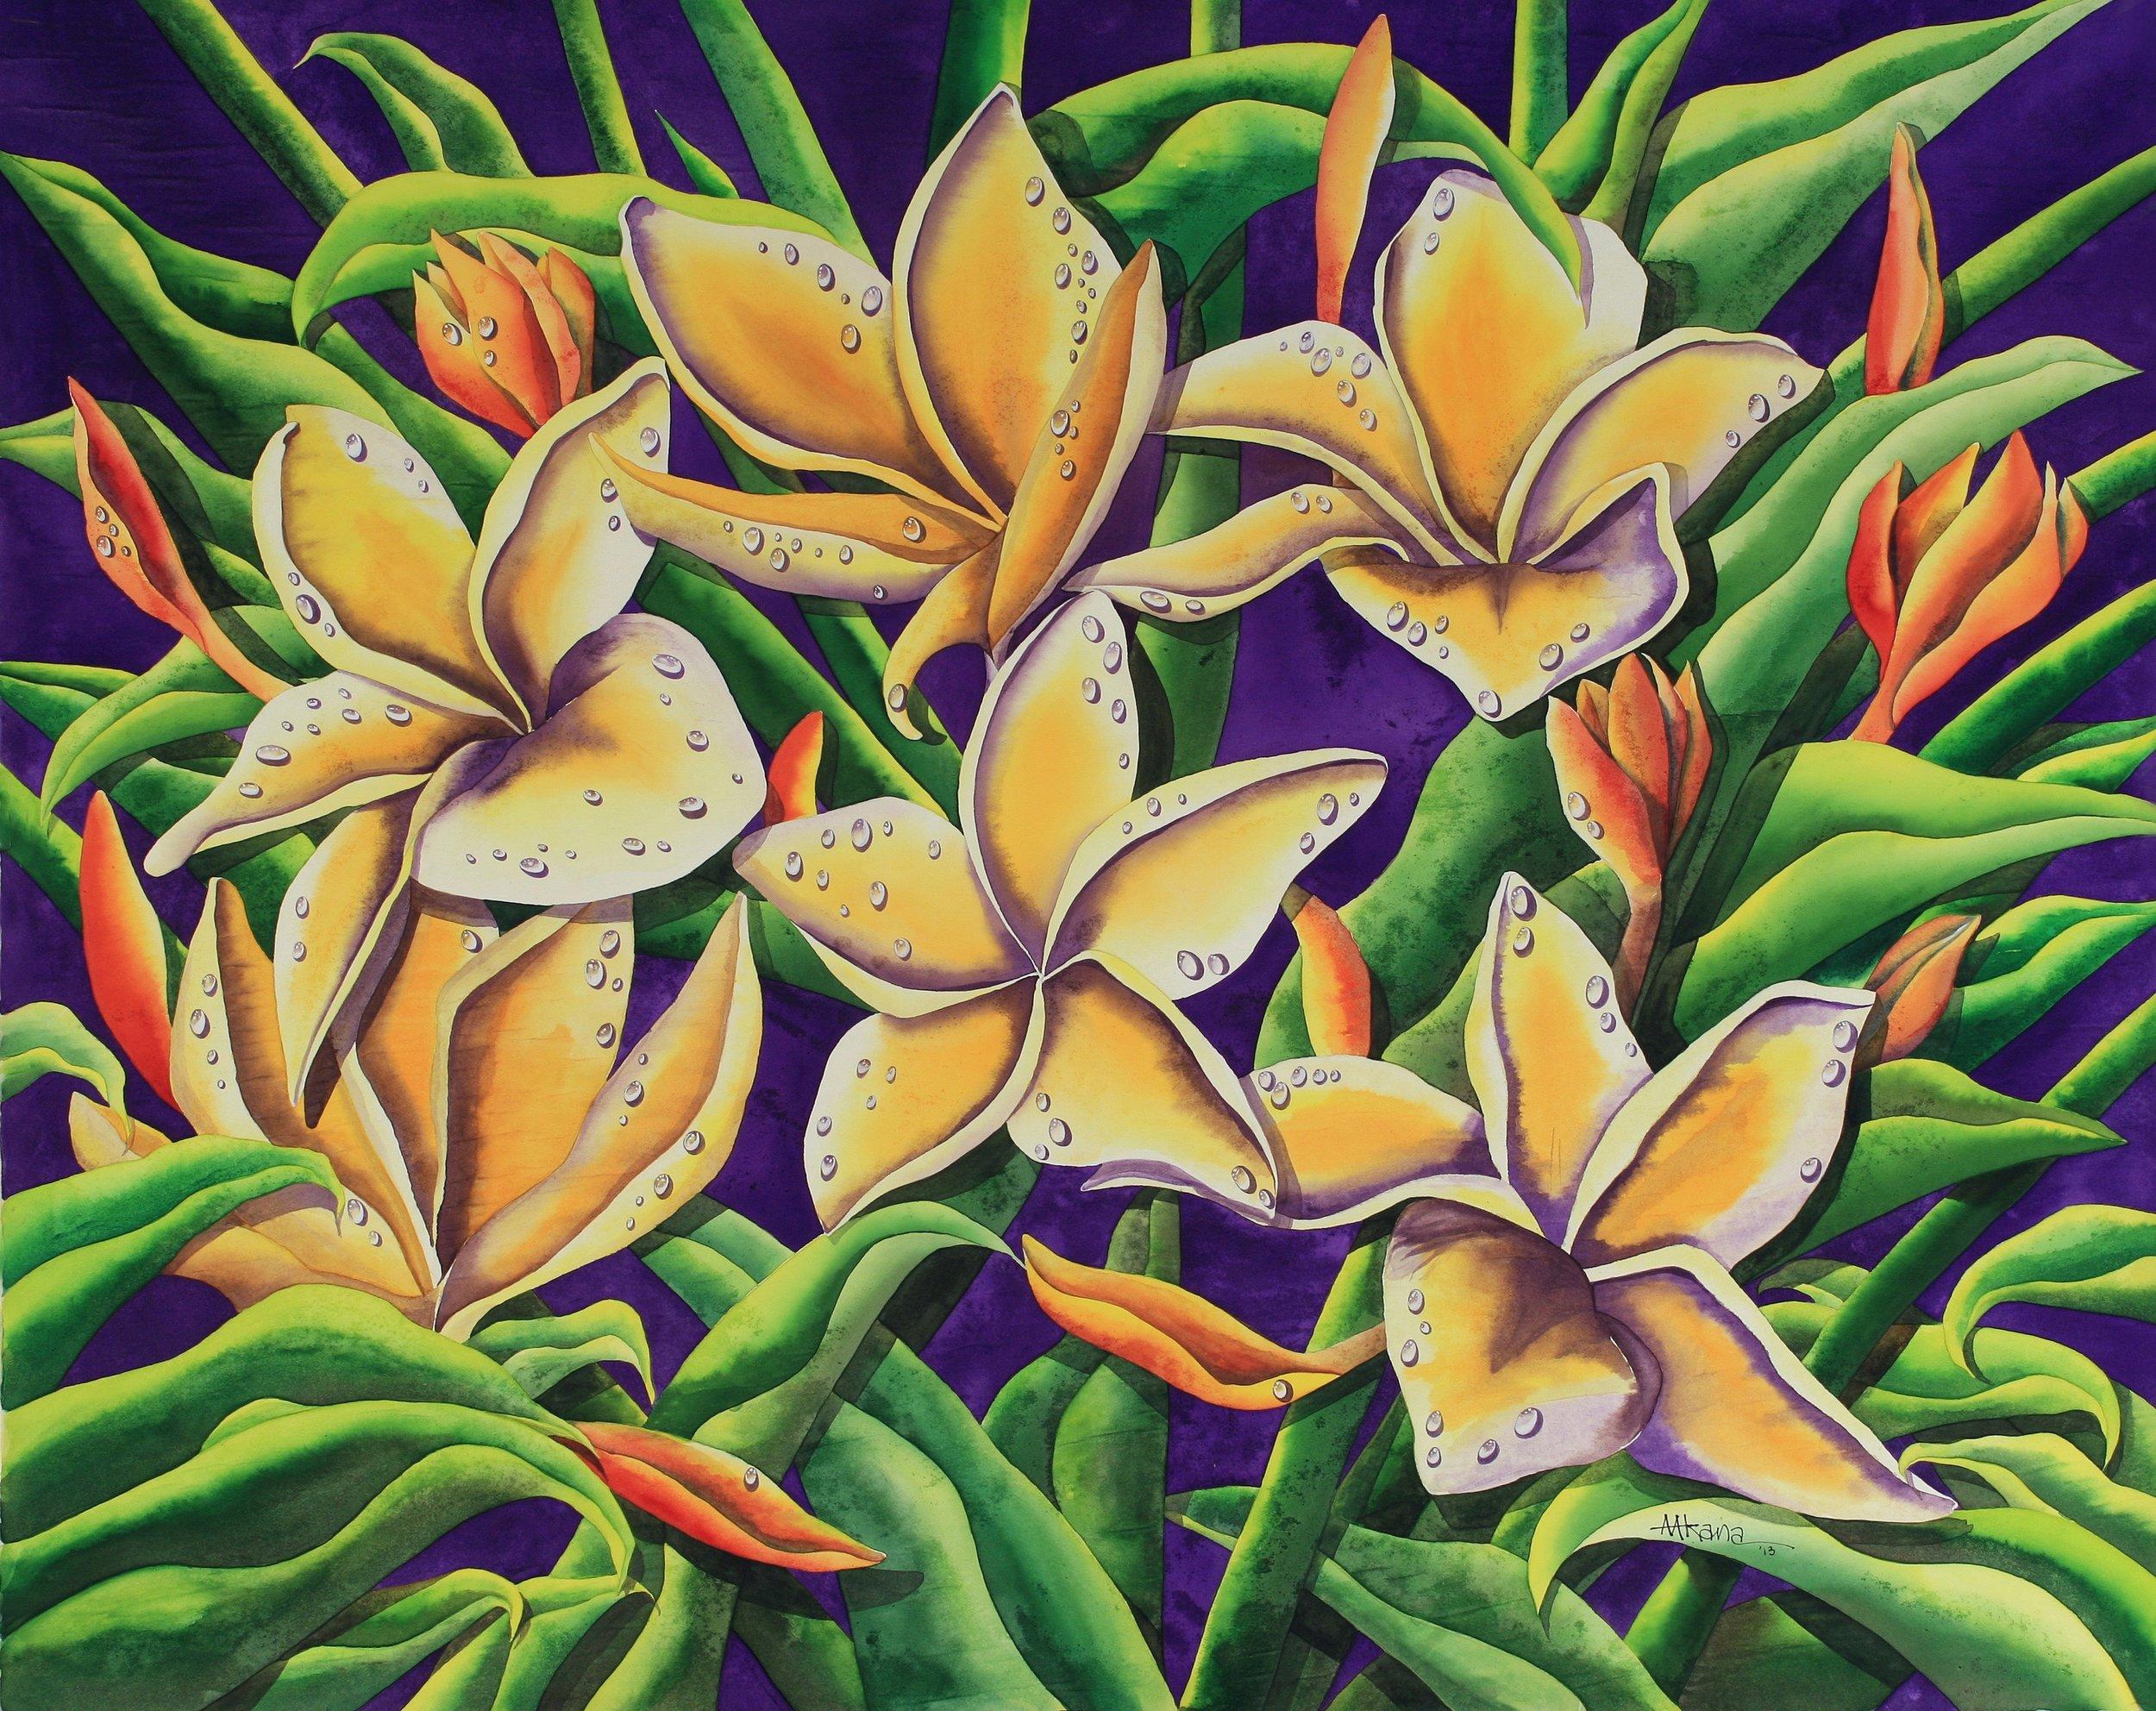 Flower_Plumeria and Fire.jpg